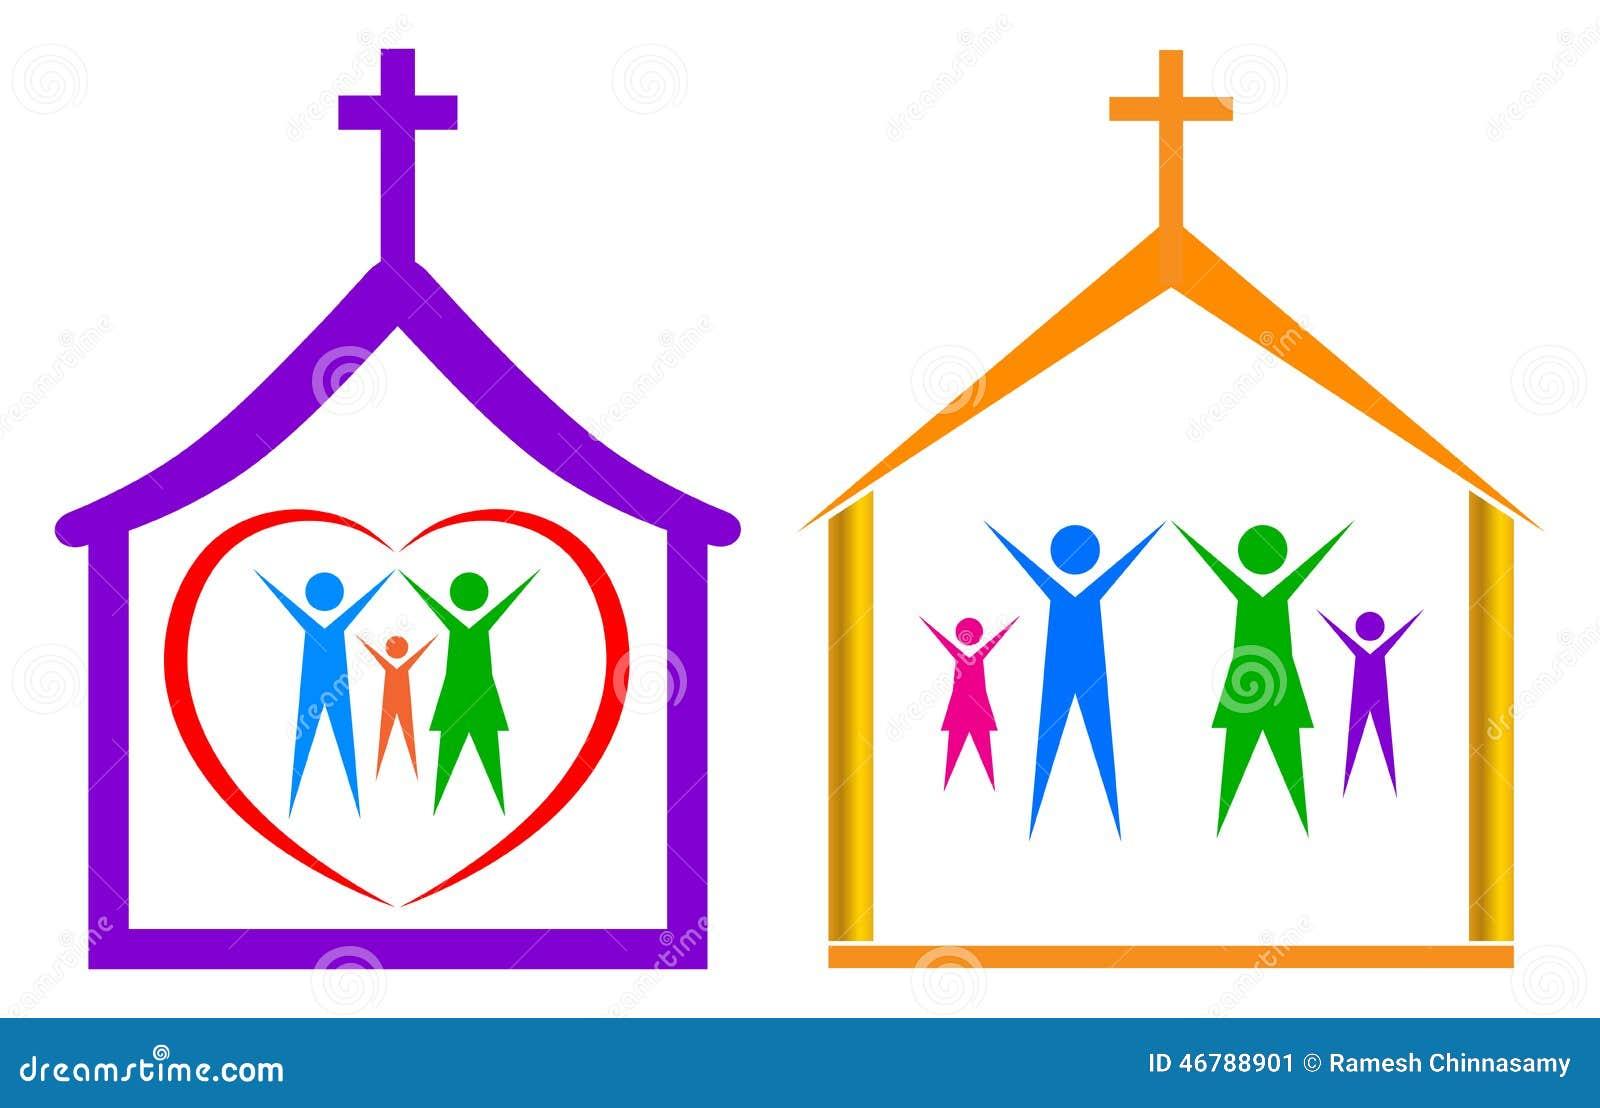 Iglesia y familia